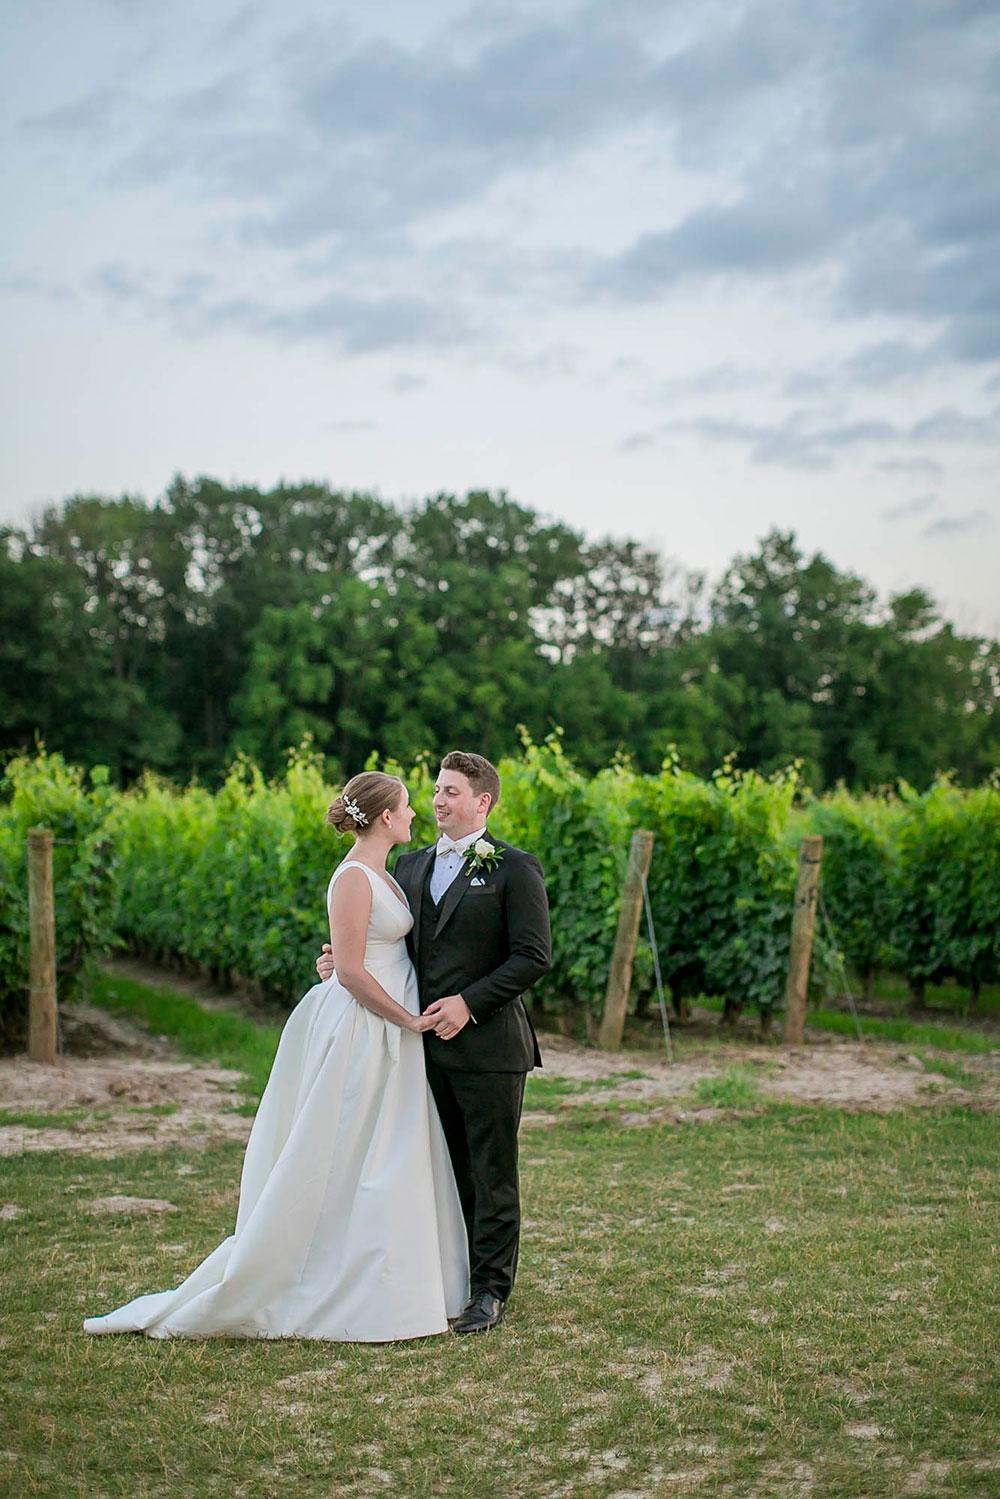 Chateau-des-Charmes-Winery-Wedding-Niagara-wedding-photographers-Philosophy-Studios-Swish-List-Vineyard-Bride-formerly-Eva-Derrick-Photography-007.jpg